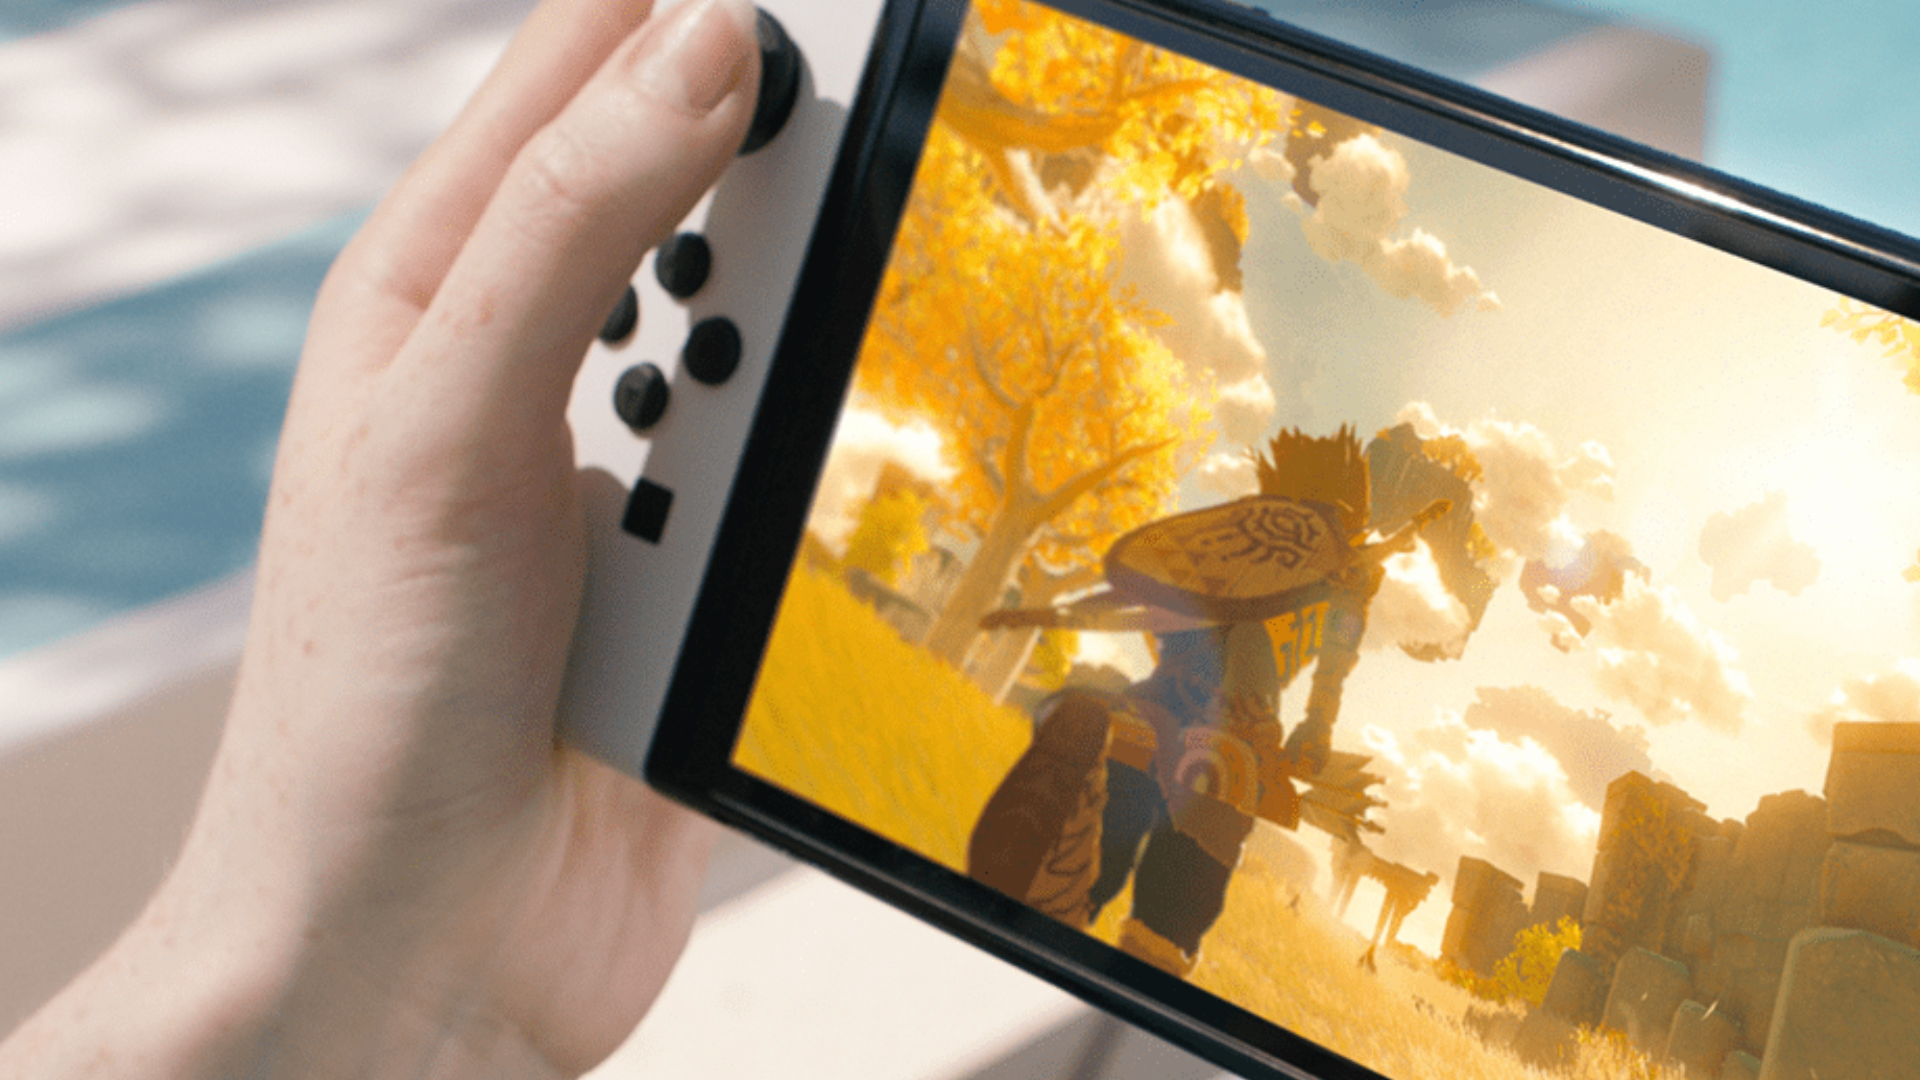 Nintendo Switch OLED Model Screen